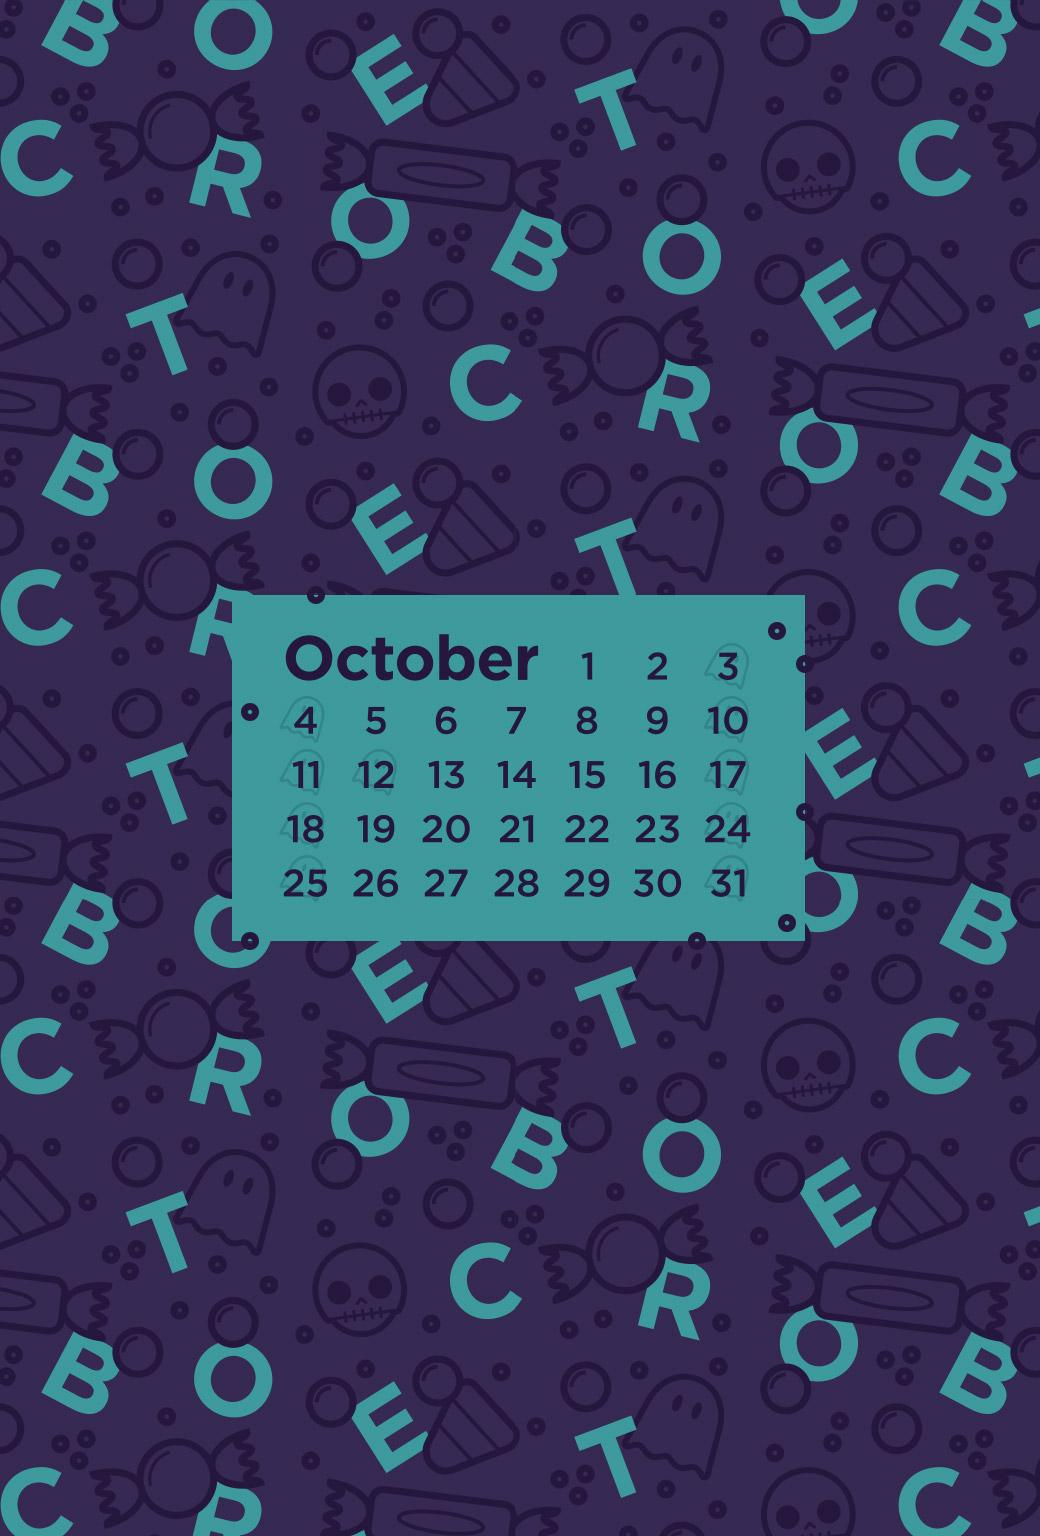 October 2015 Desktop Calendar Wallpaper Paper Leaf 1040x1536